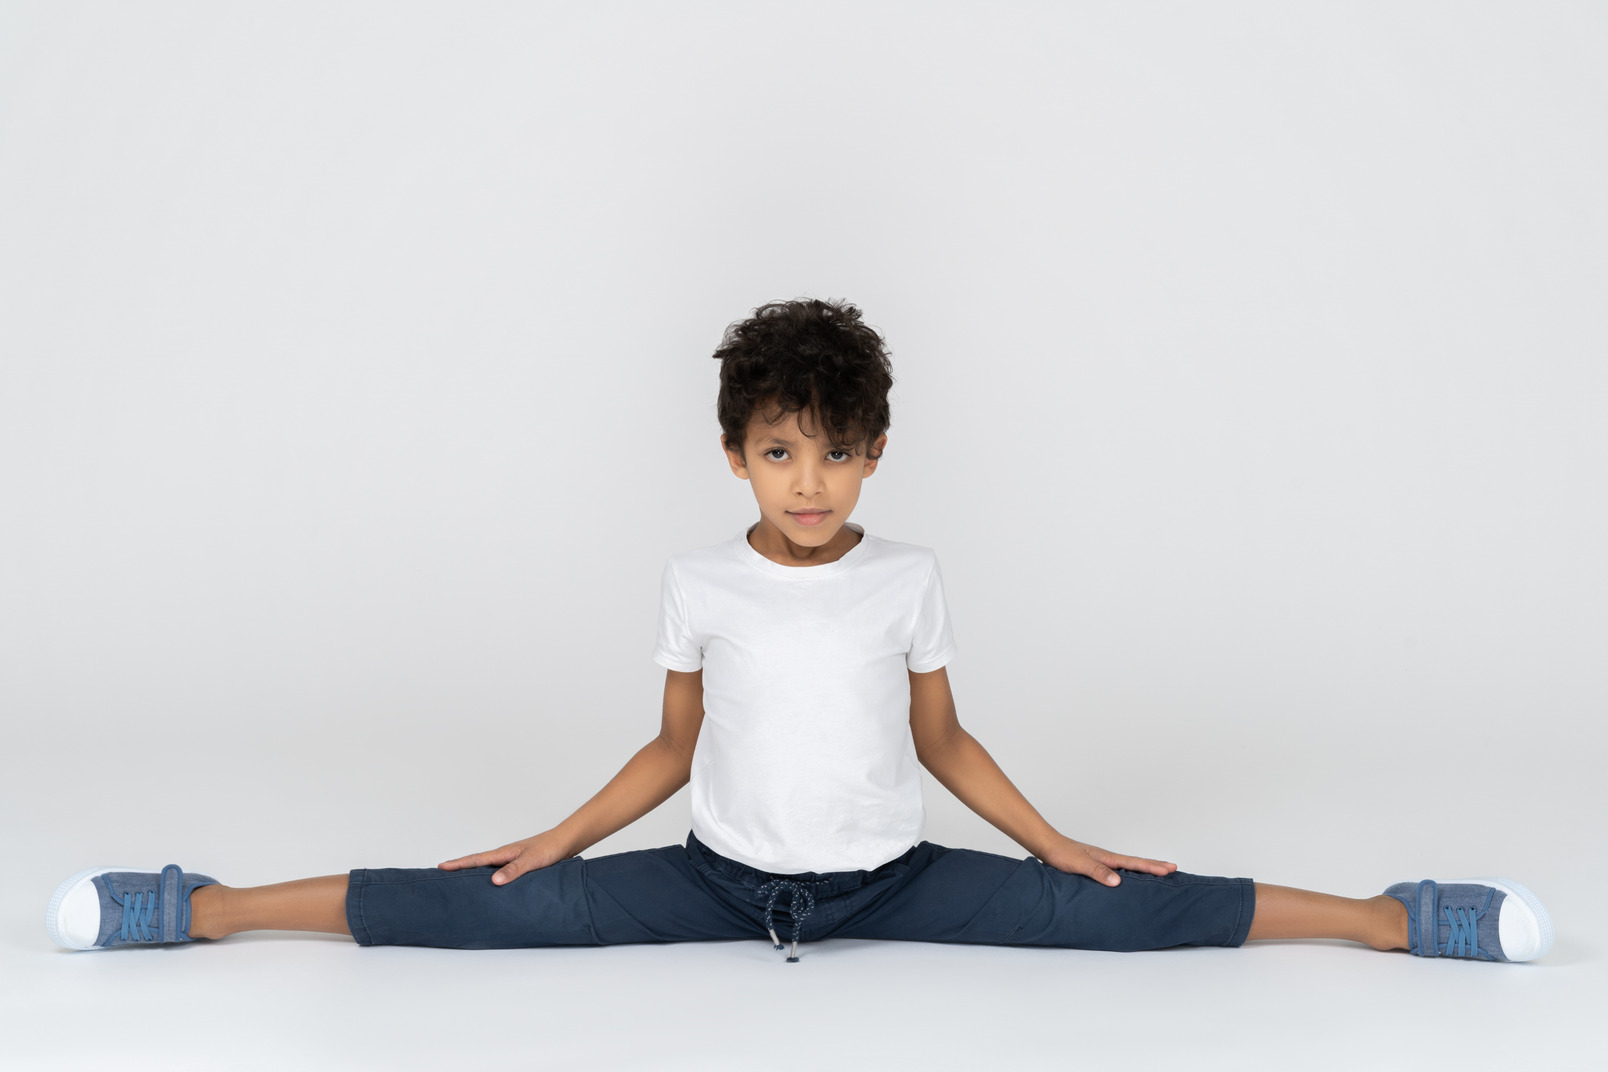 A boy doing split exercise